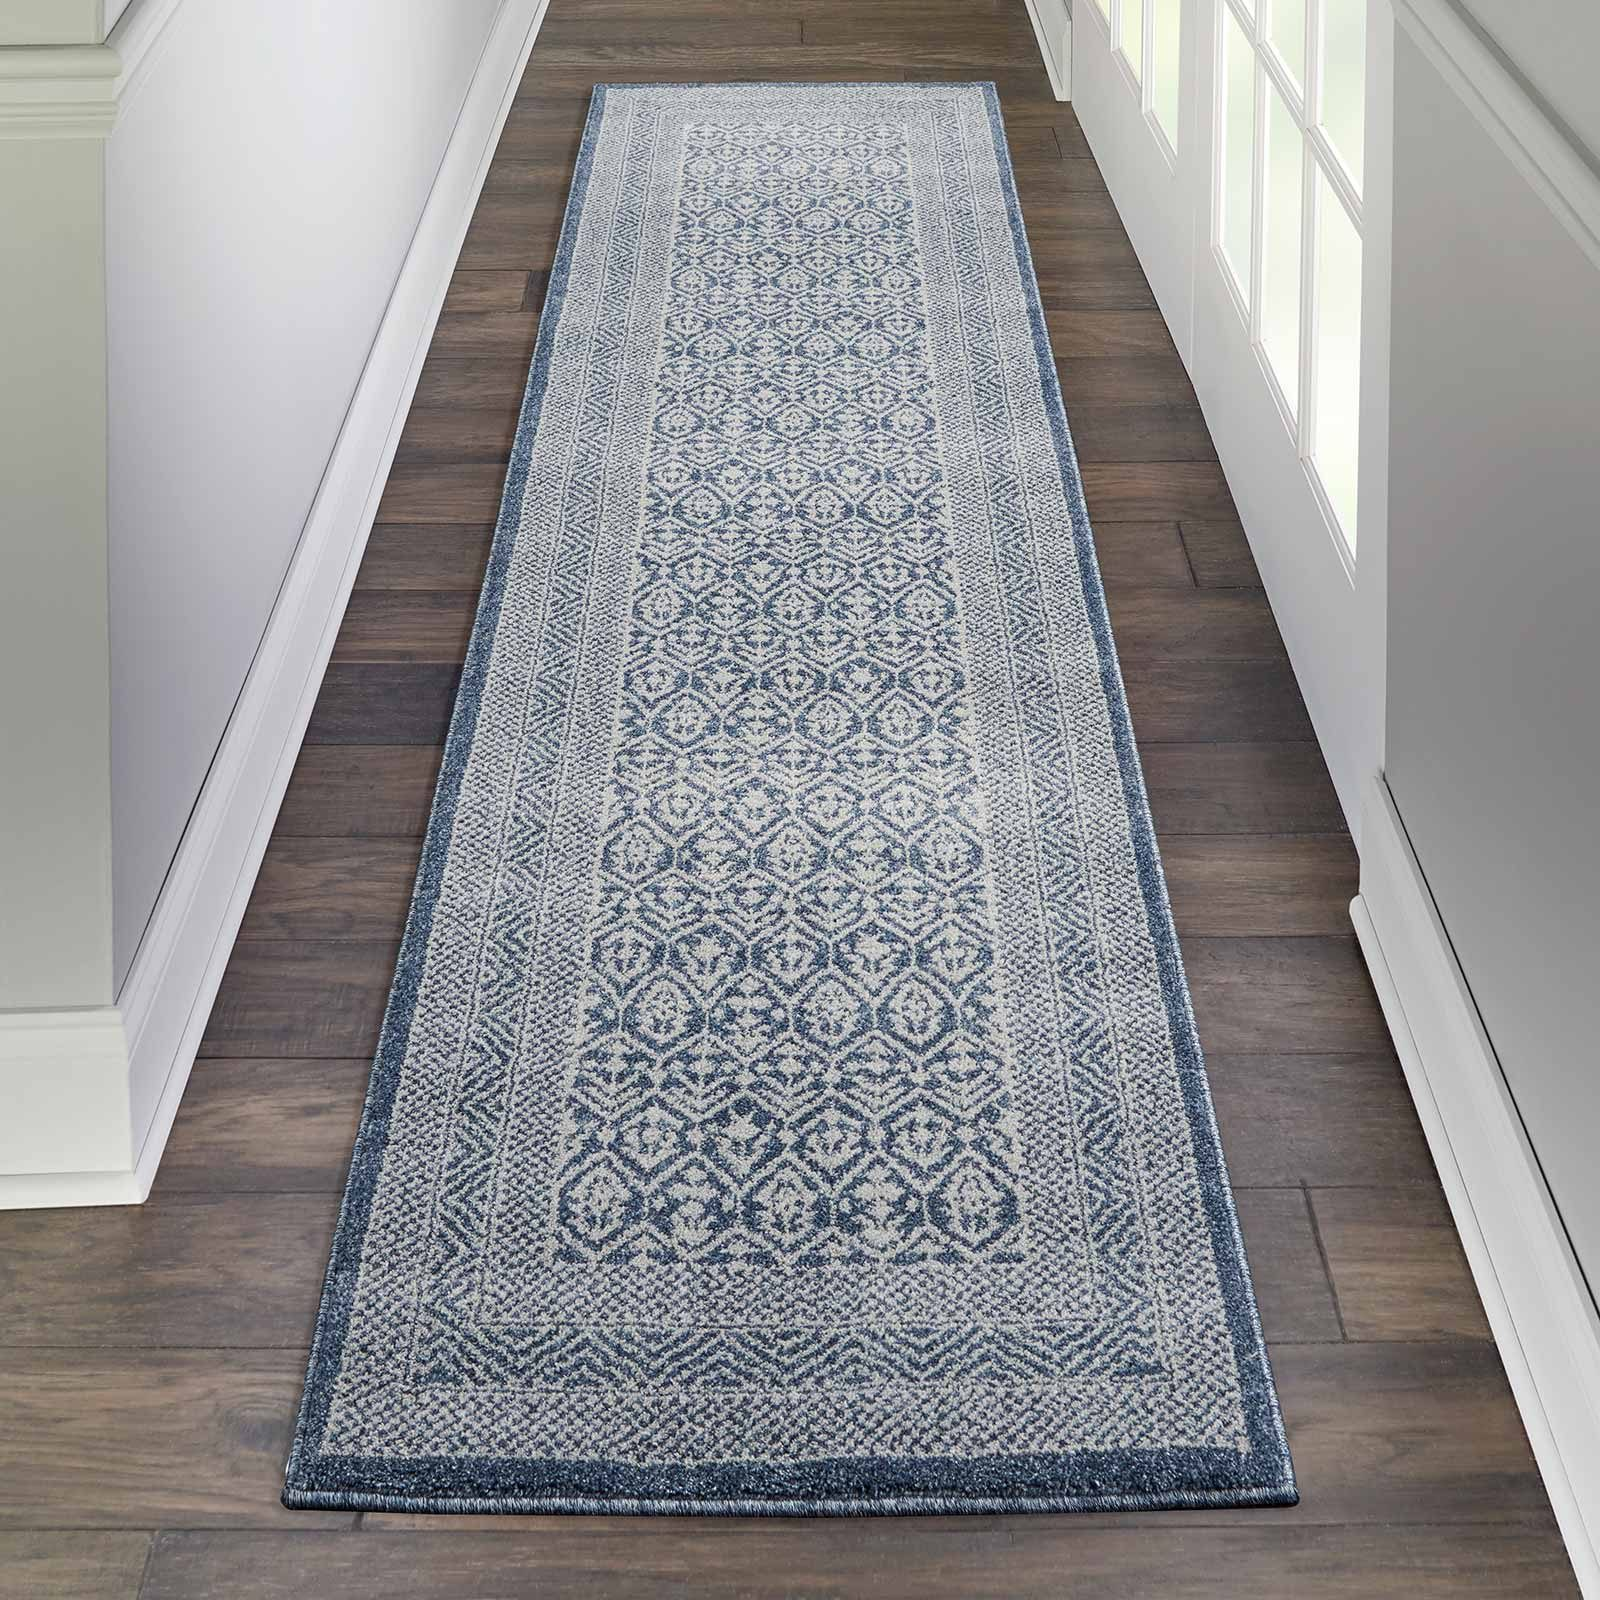 Nourison rug Palermo PMR01 BLUE GREY 2x8 099446719584 interior 1